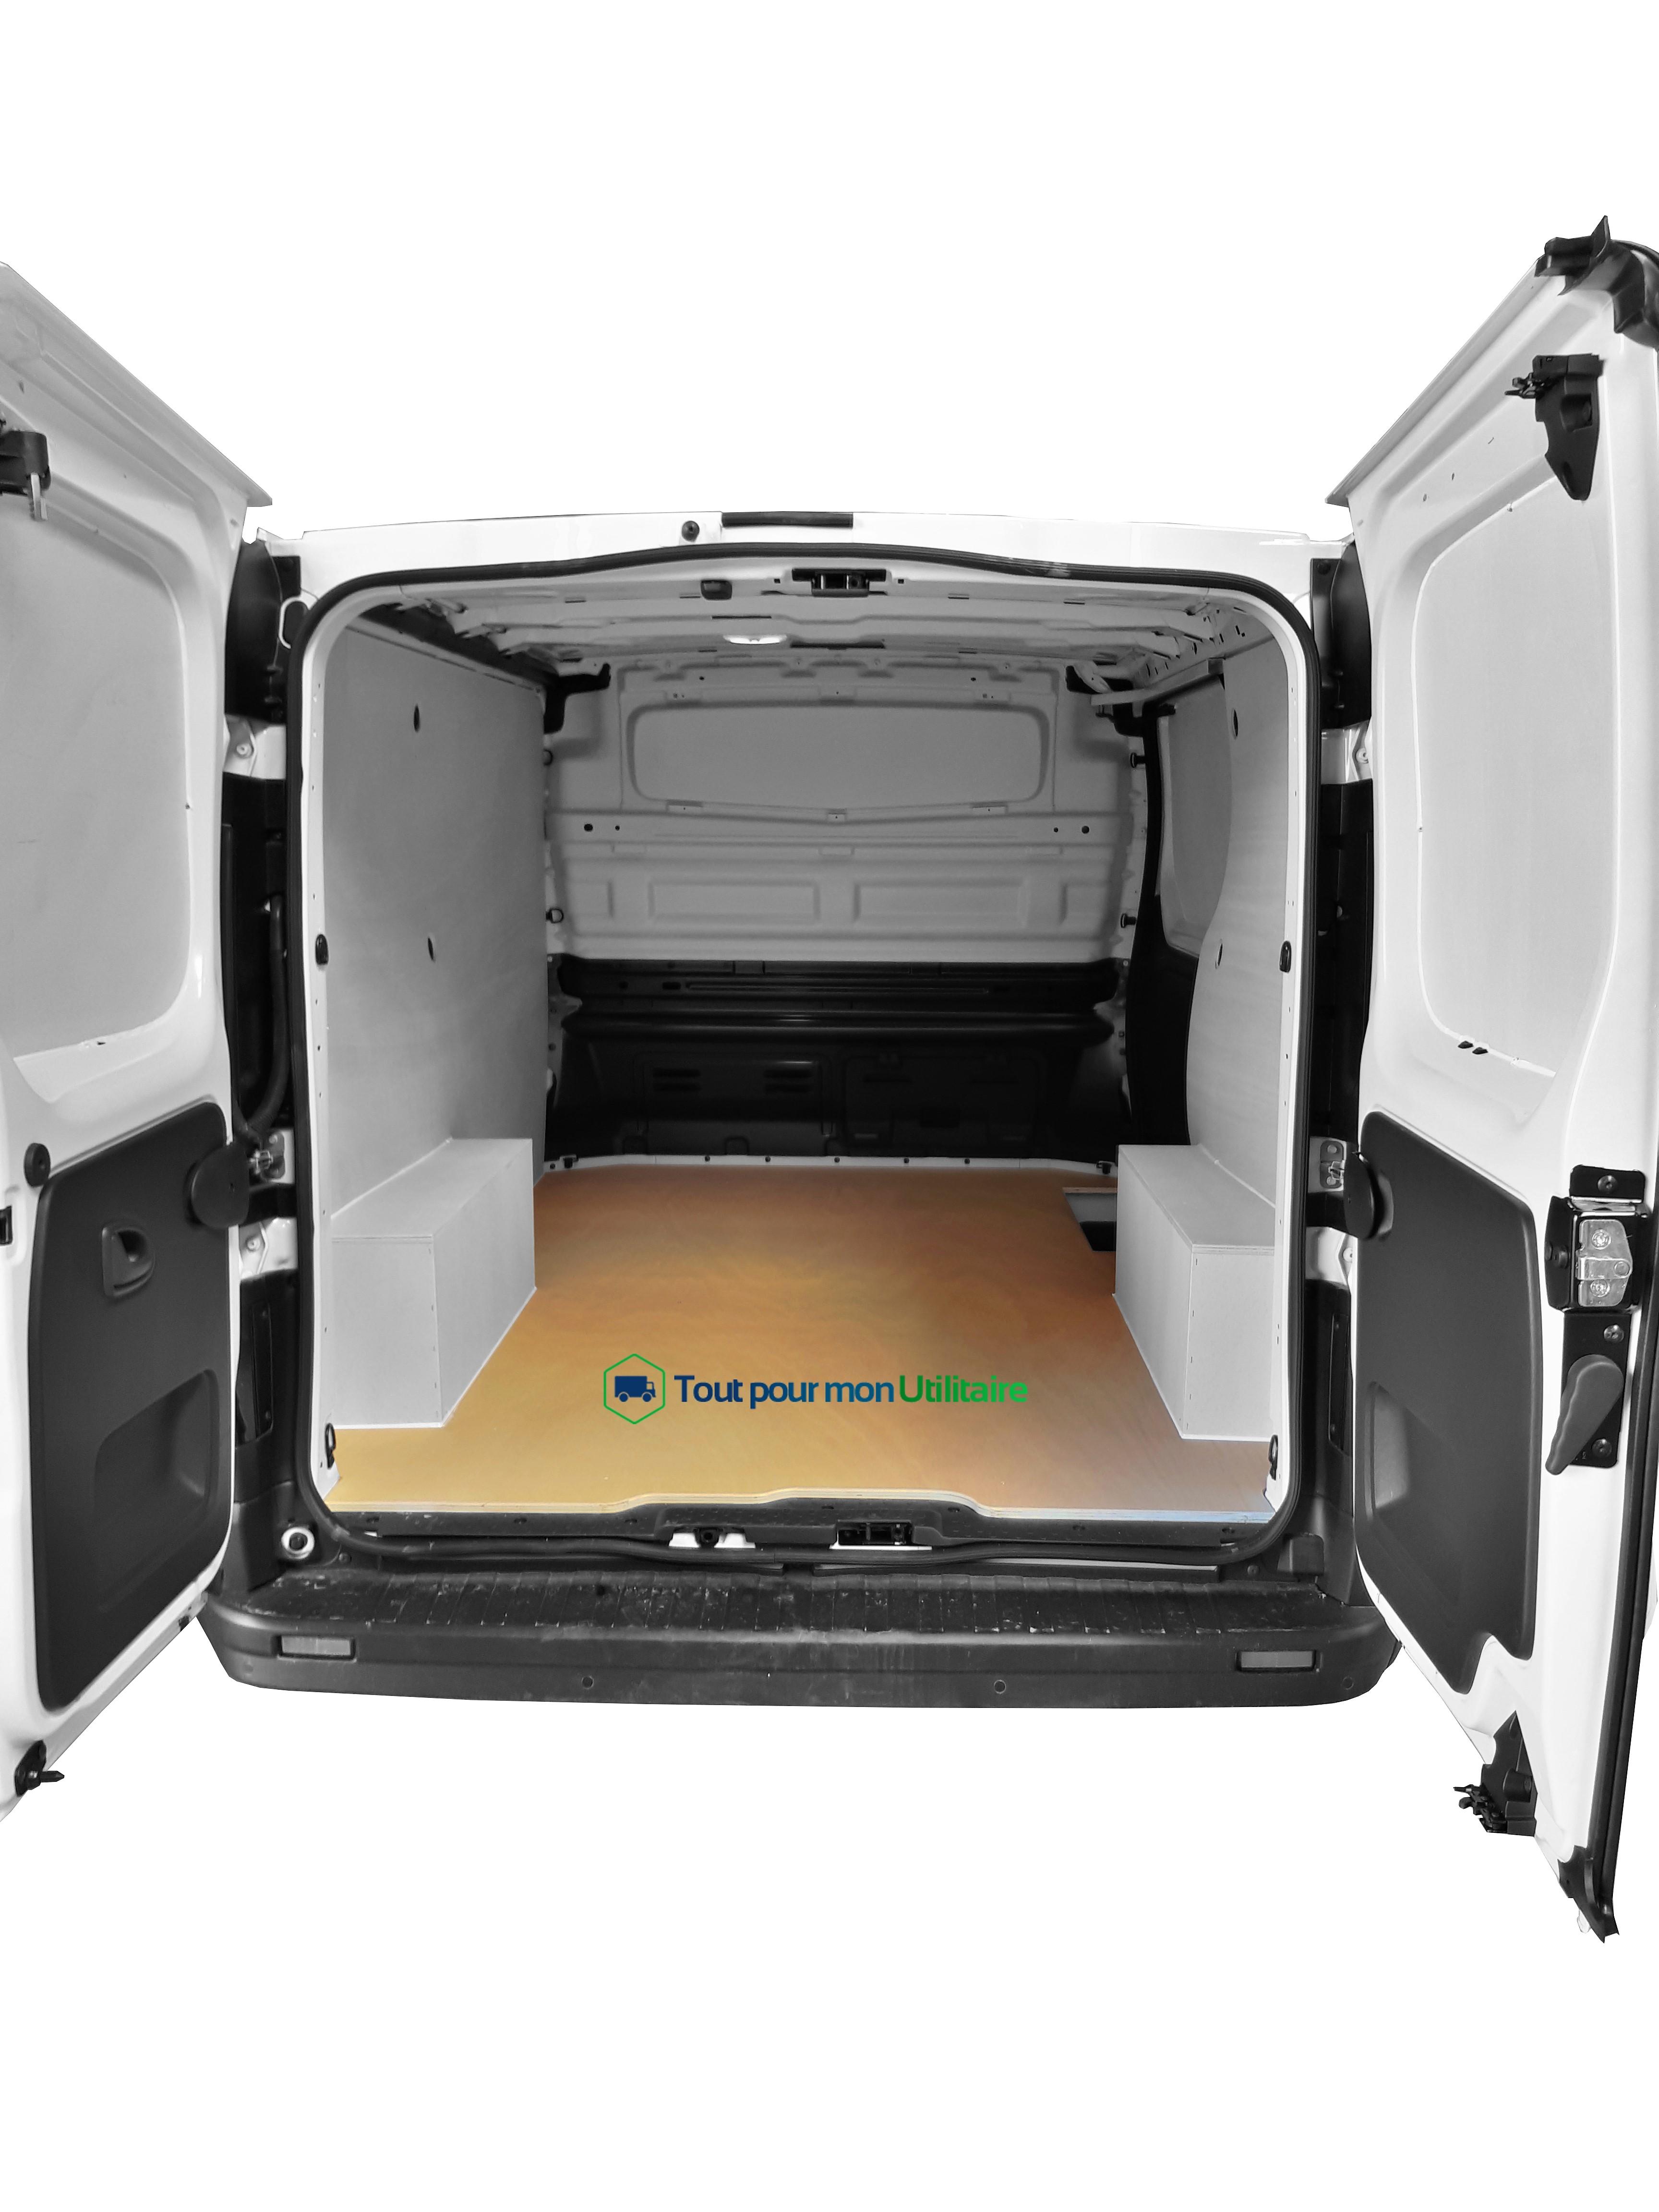 plancher de protection bois renault trafic l2 0 plc. Black Bedroom Furniture Sets. Home Design Ideas